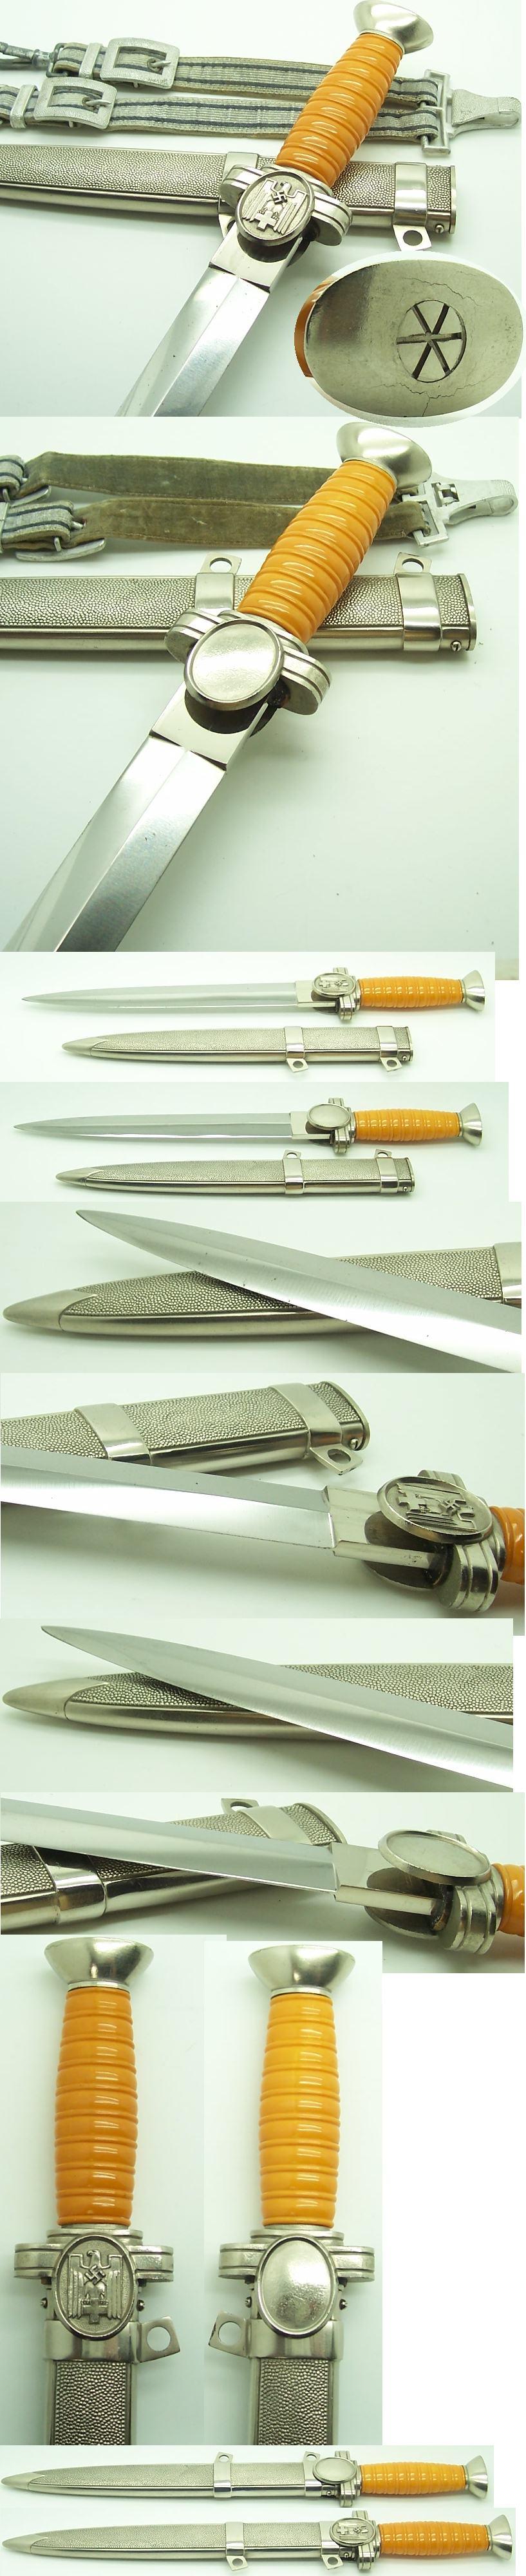 Social Welfare Leader Dagger with Hangers